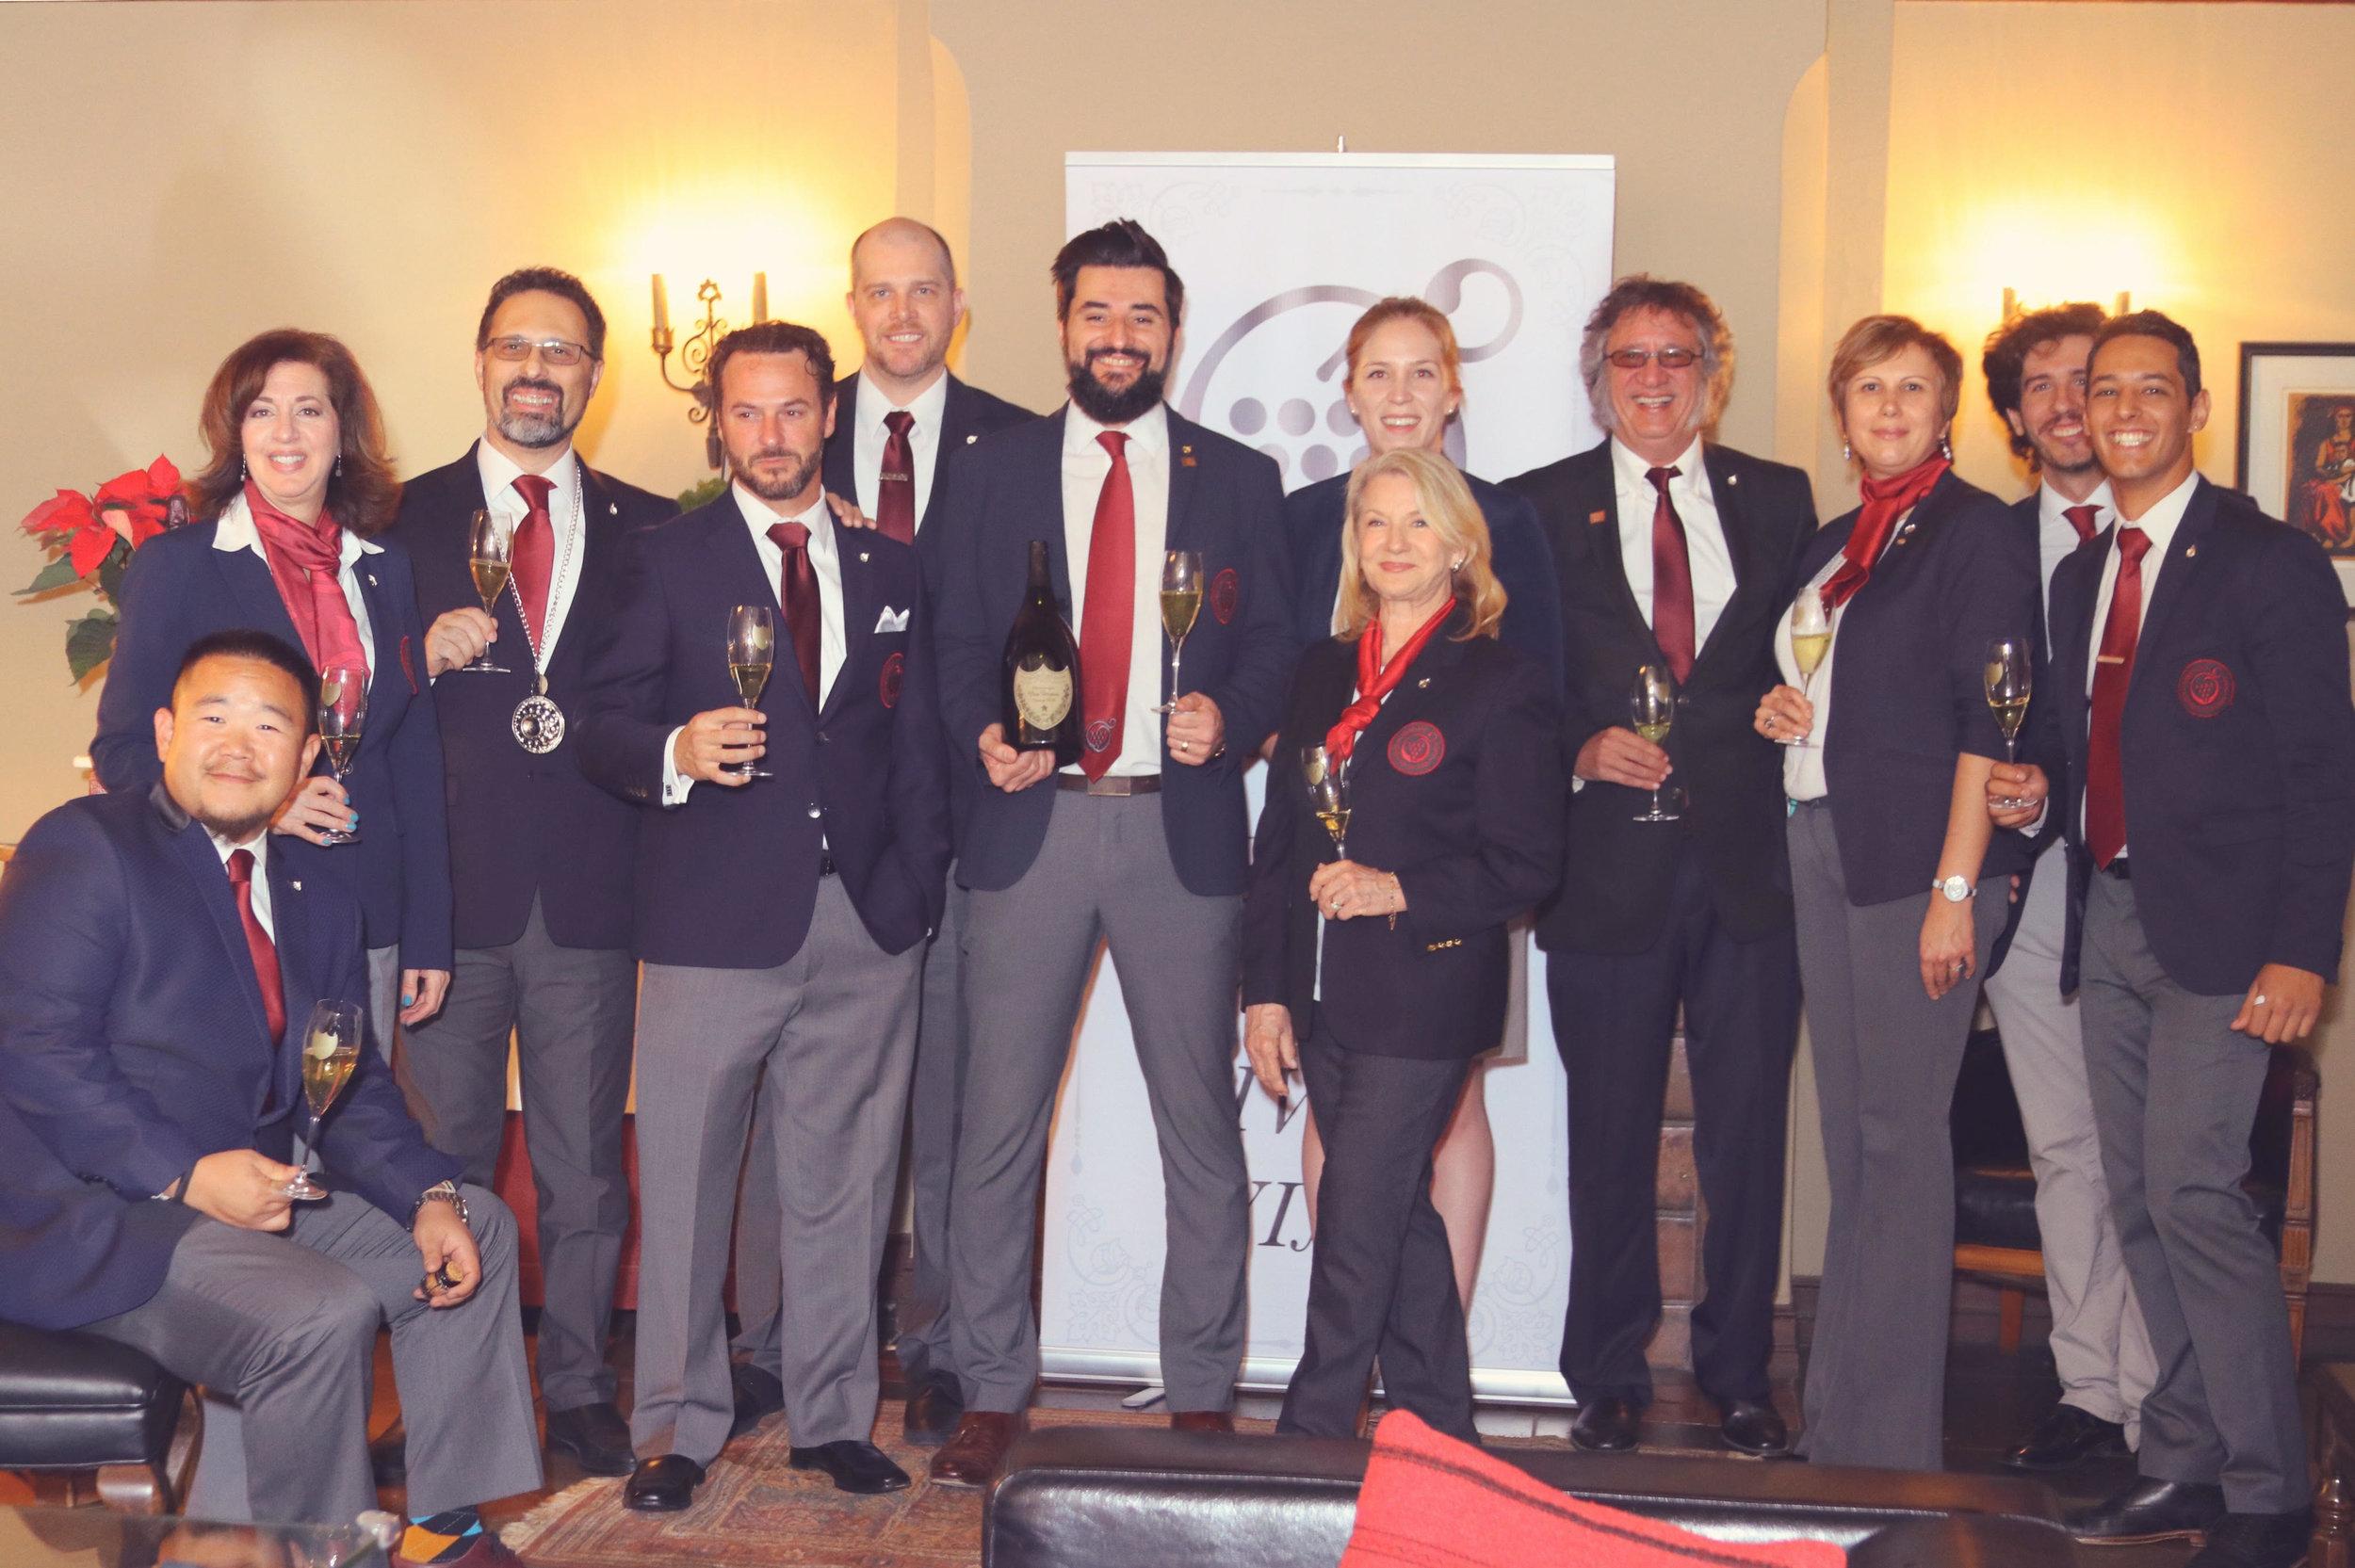 The NASA Executive Council and Silver-Pin graduates of 2017 ! (photo by Simona Maffei)